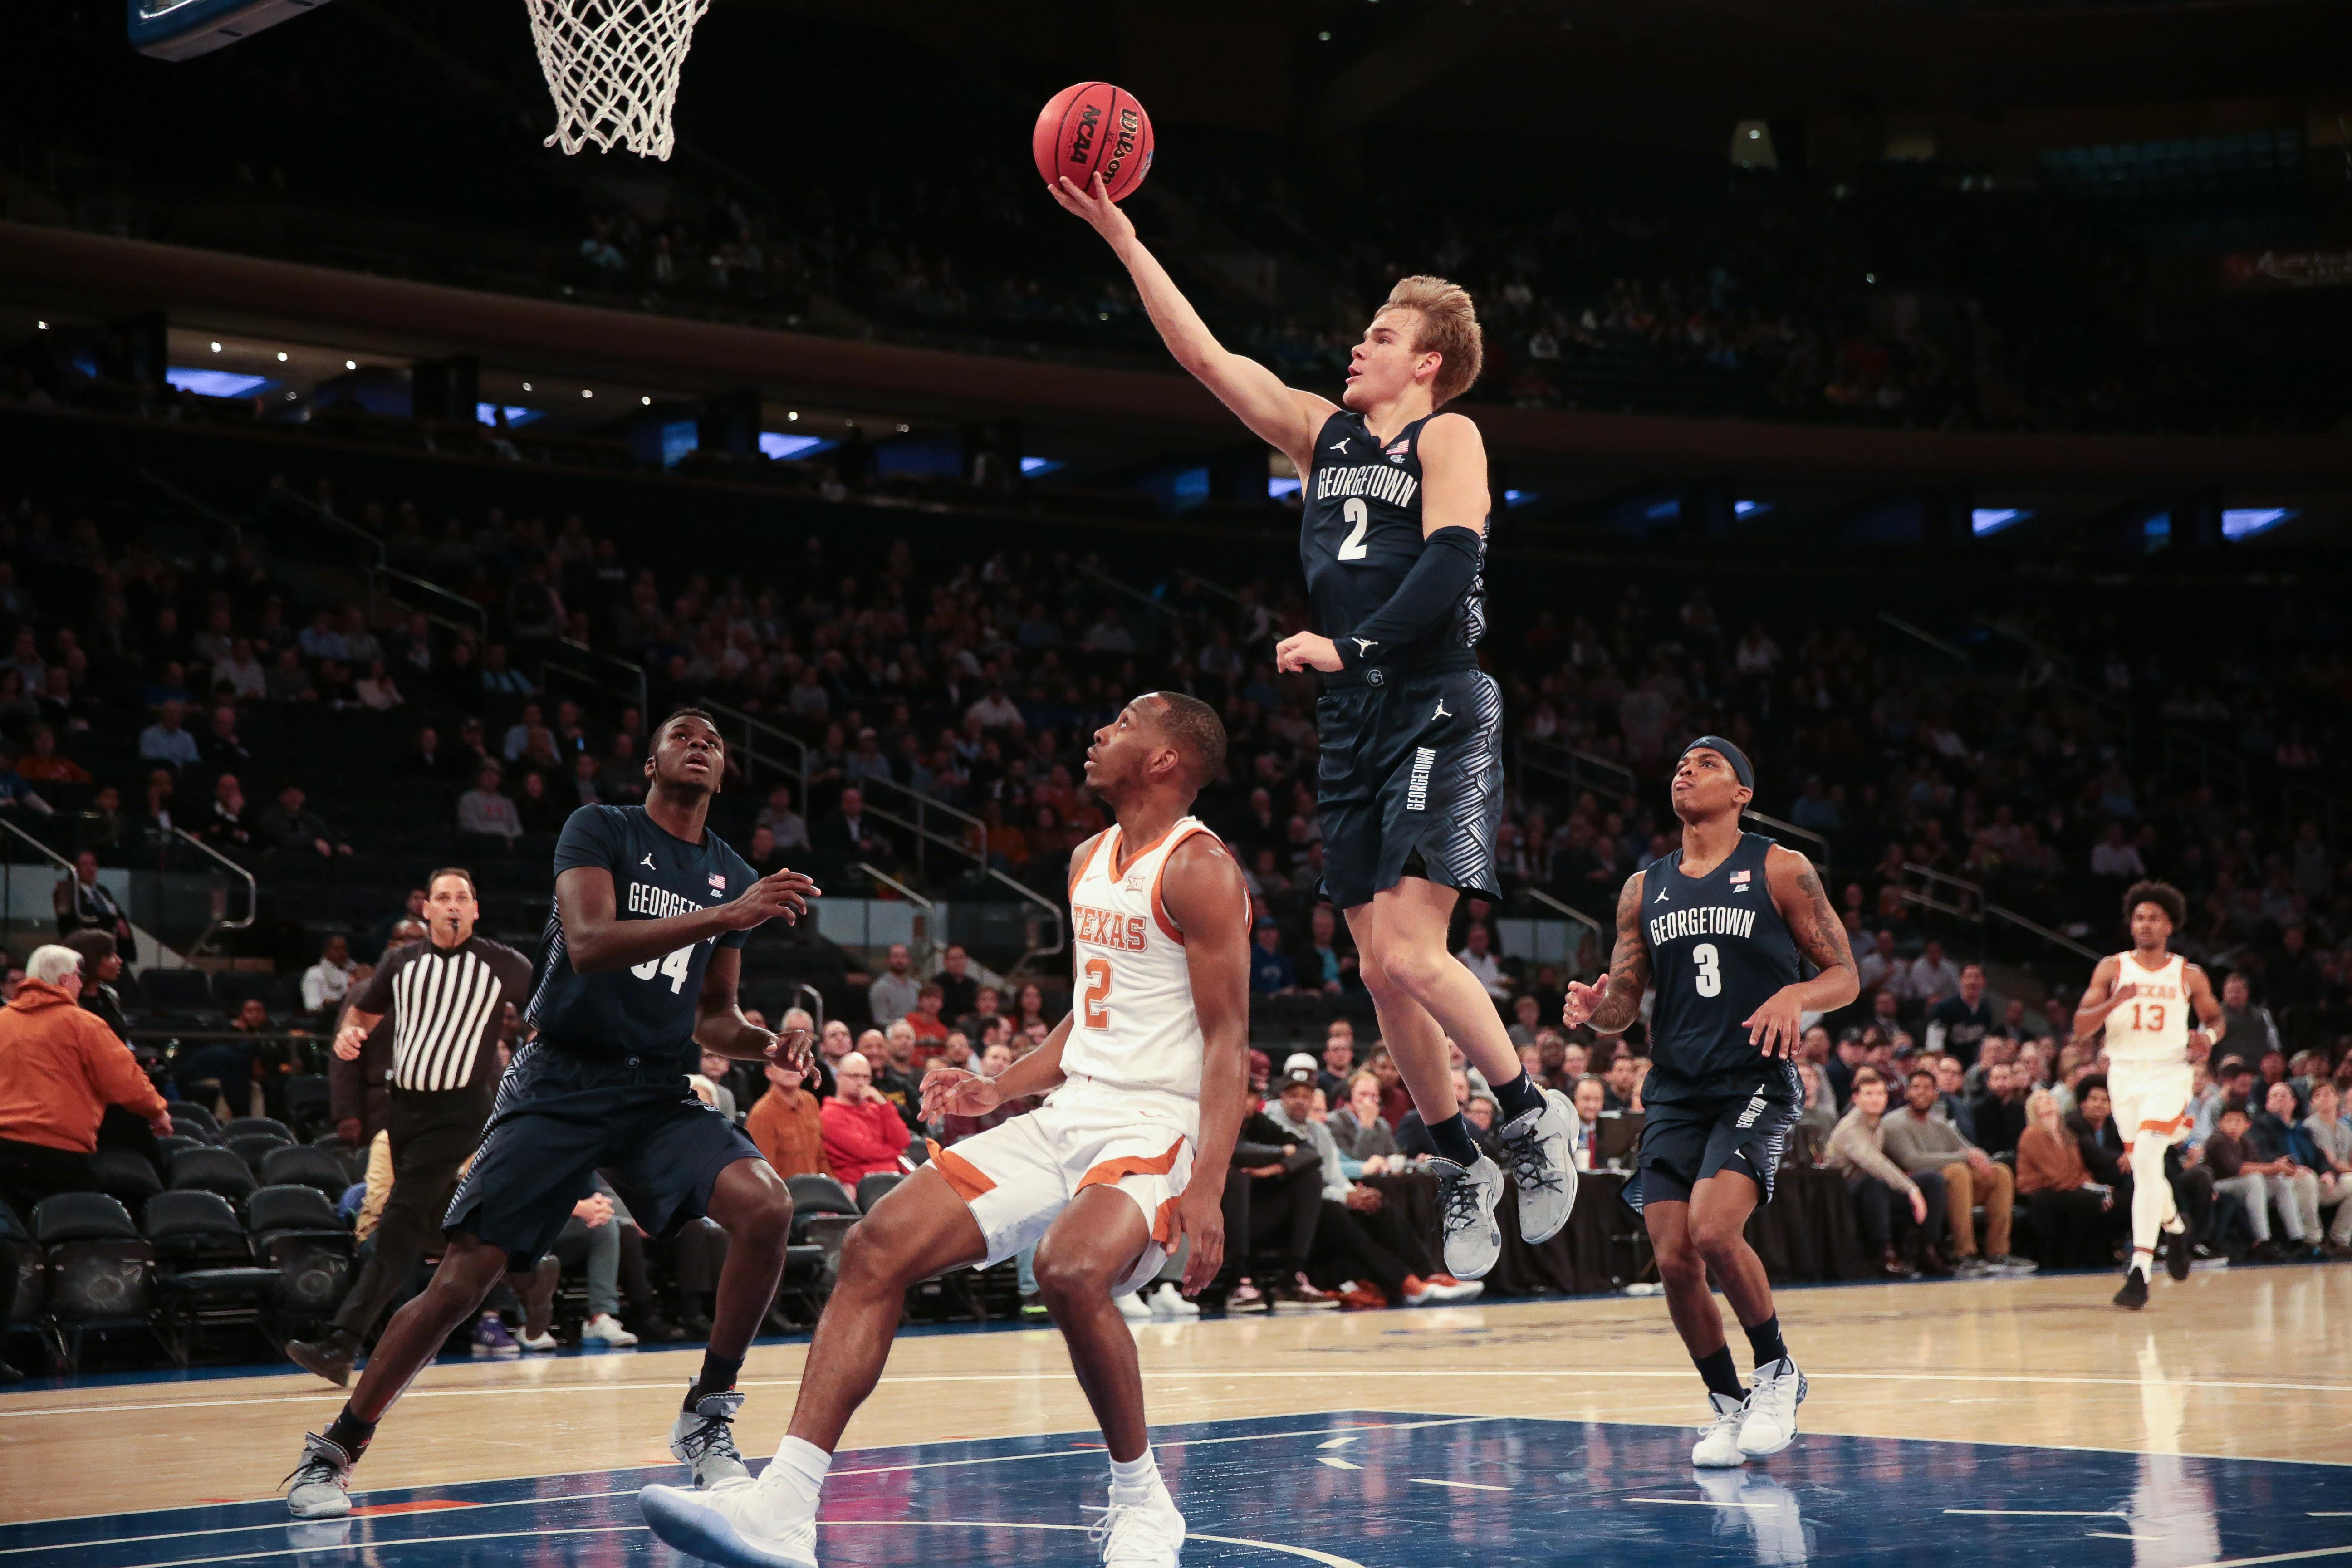 NCAA Basketball: Georgetown at Texas